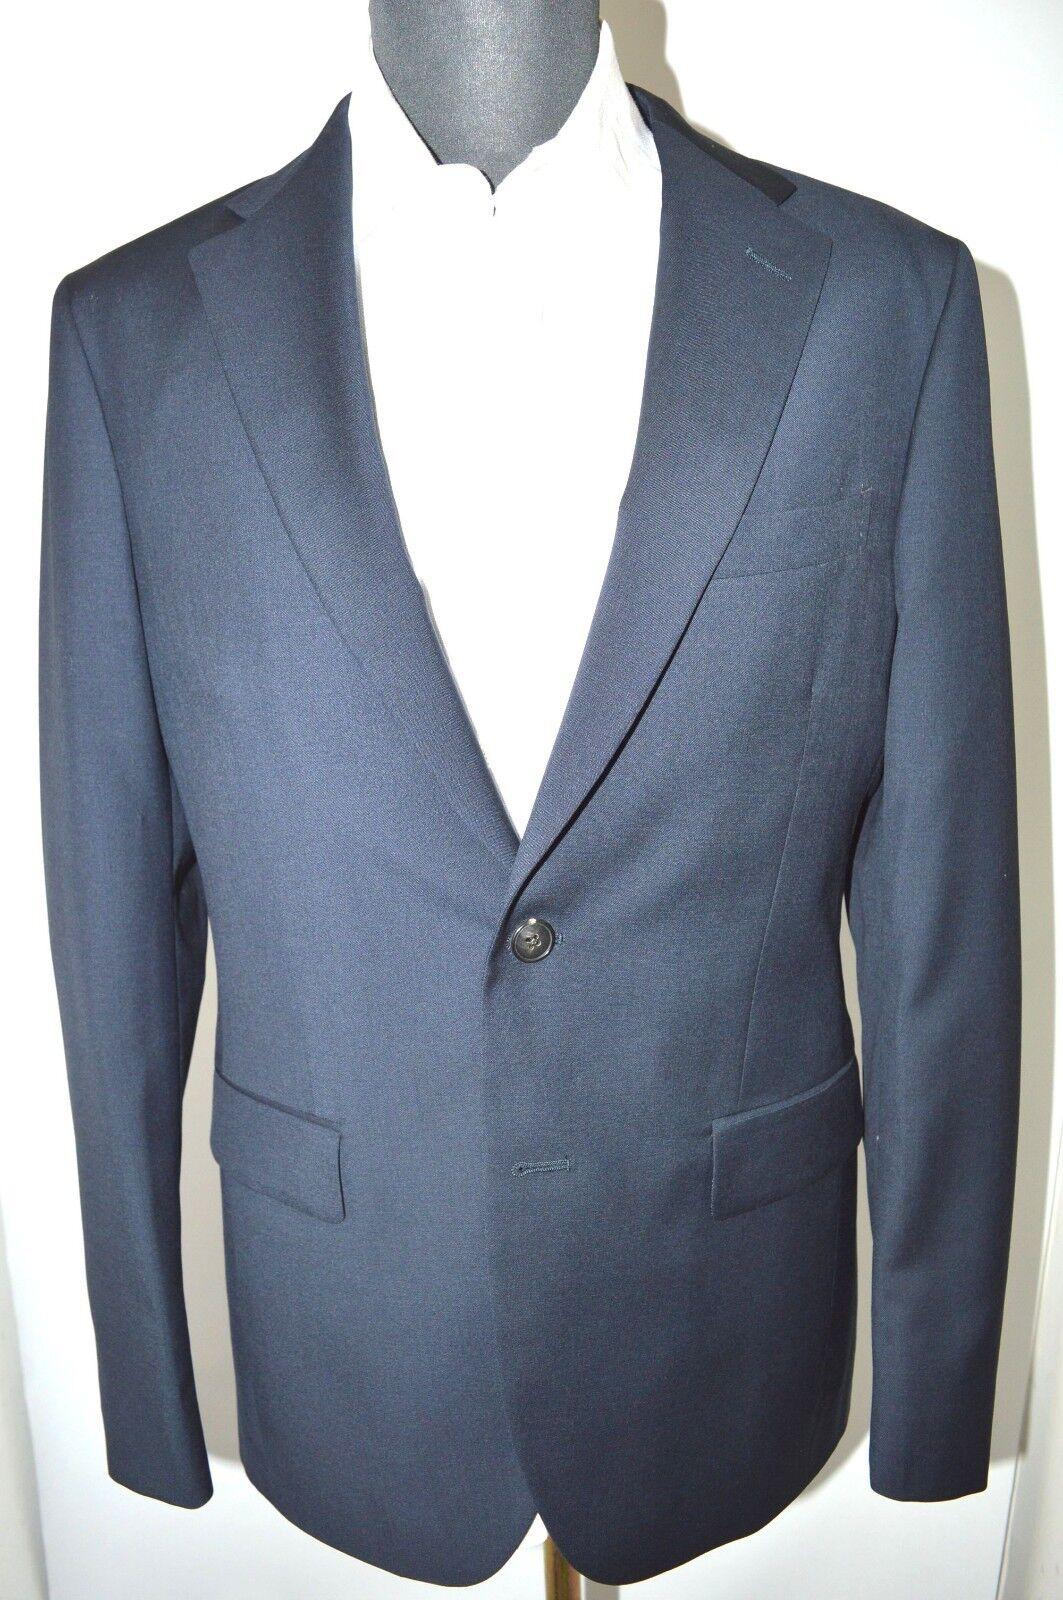 NEW BOGLIOLI Milano SFORZA Suit  100% Wool Größe 38 Us 48 Eu 2BTN (B2)